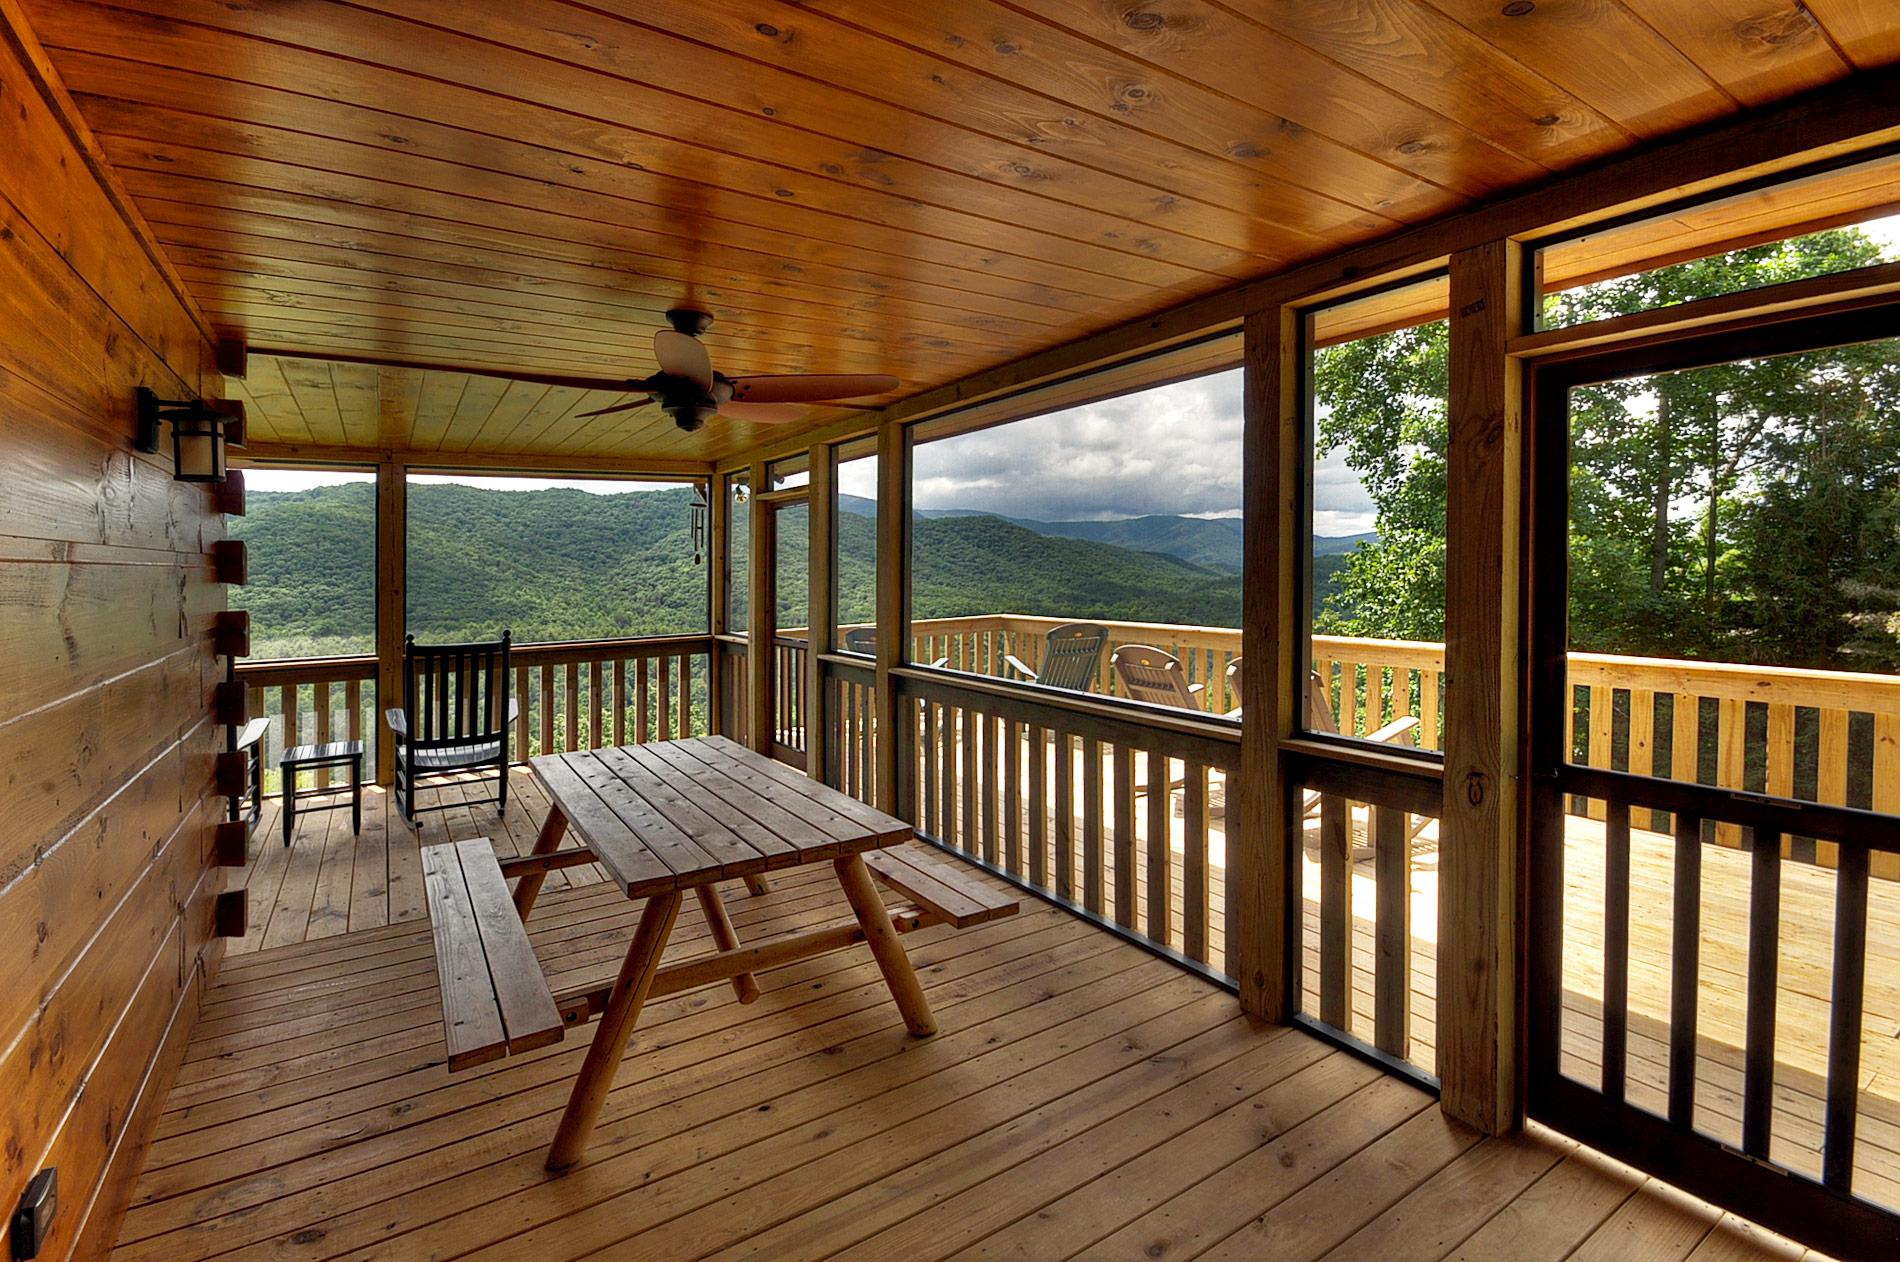 rocker outdoor chairs dolls high chair toys r us deck & porch tour   above the clouds cabin - blue ridge, ga